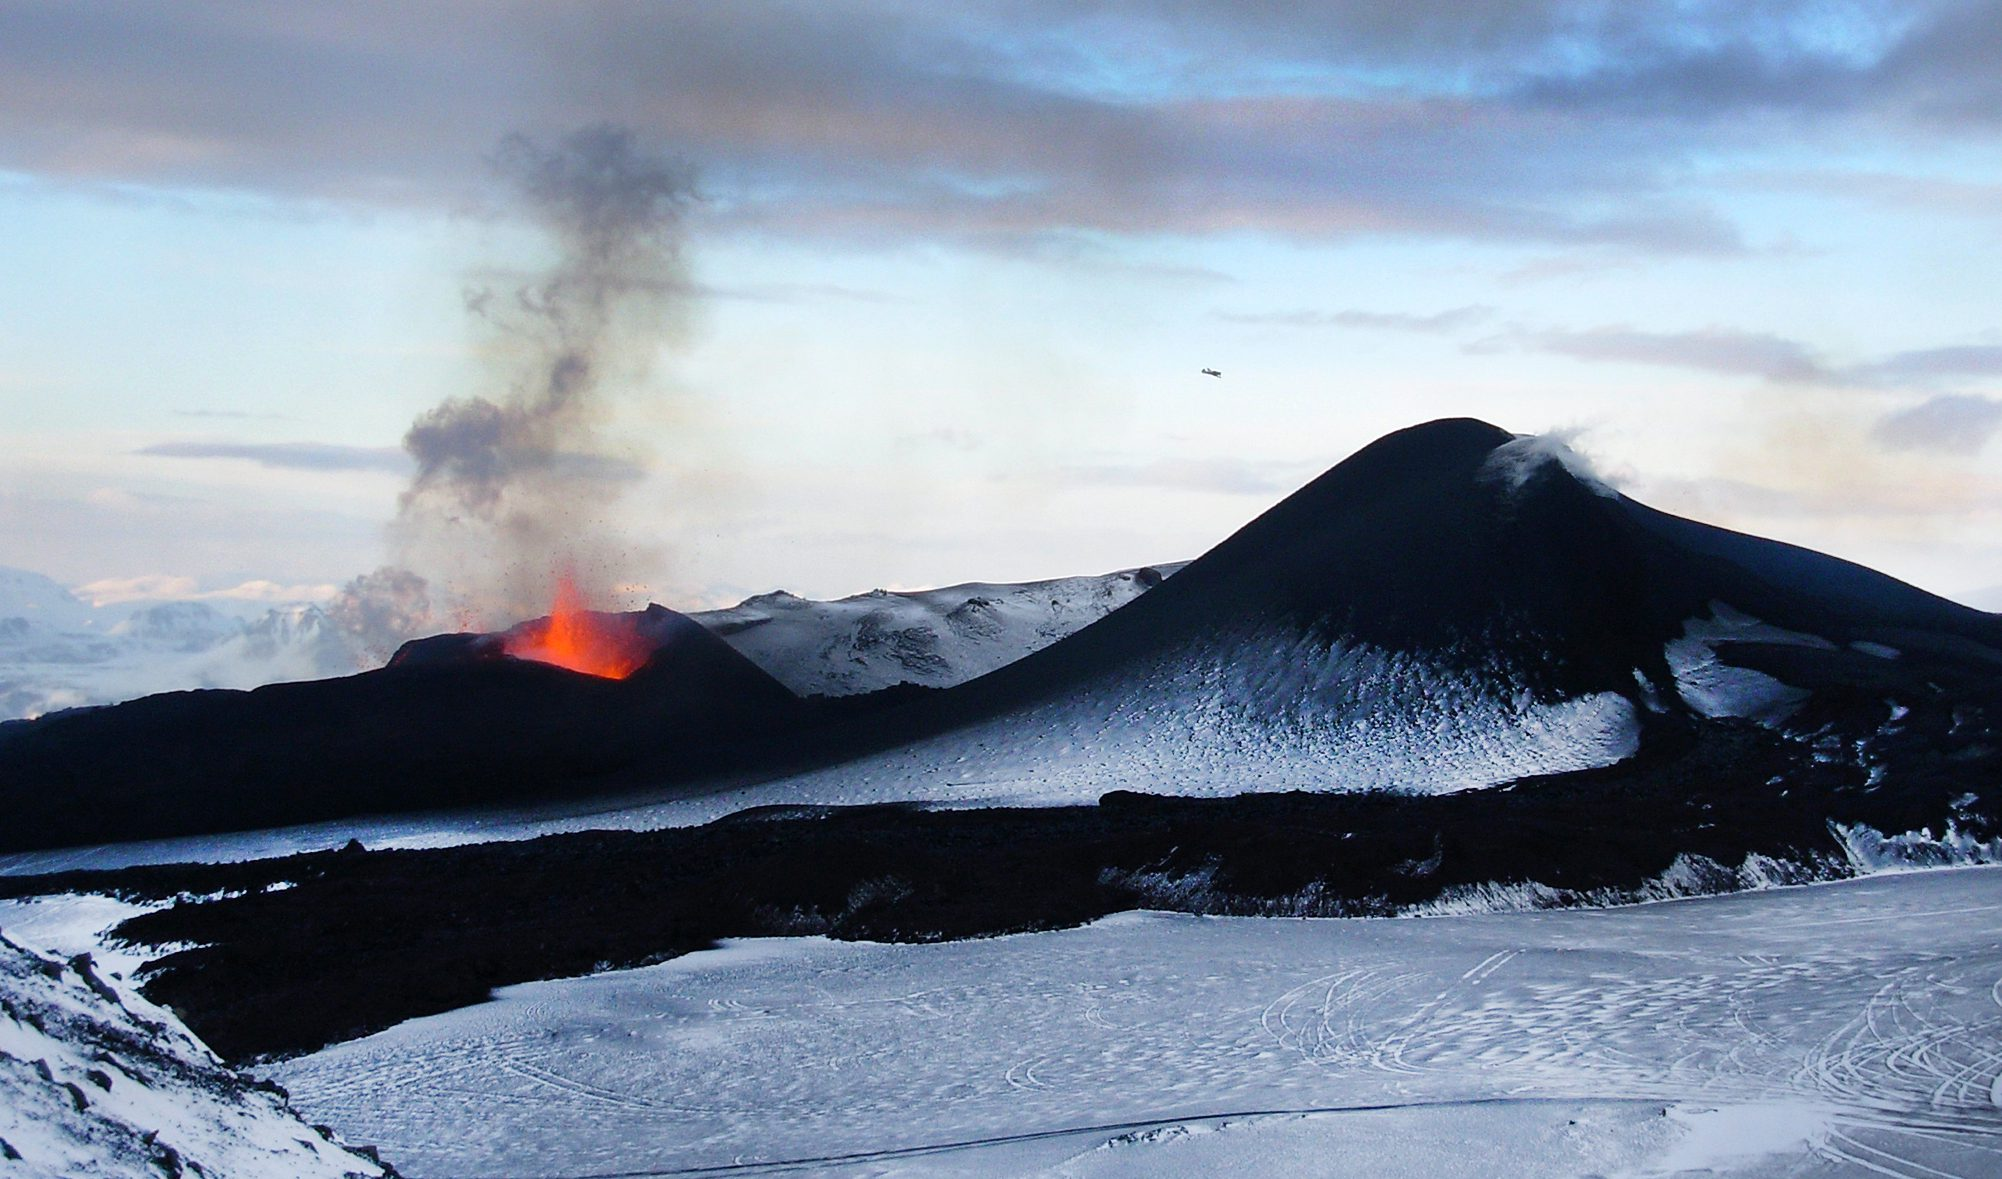 Island, Suedisland, Vulkanausbruch 2010, Vulkan, Lava, Winter Schnee